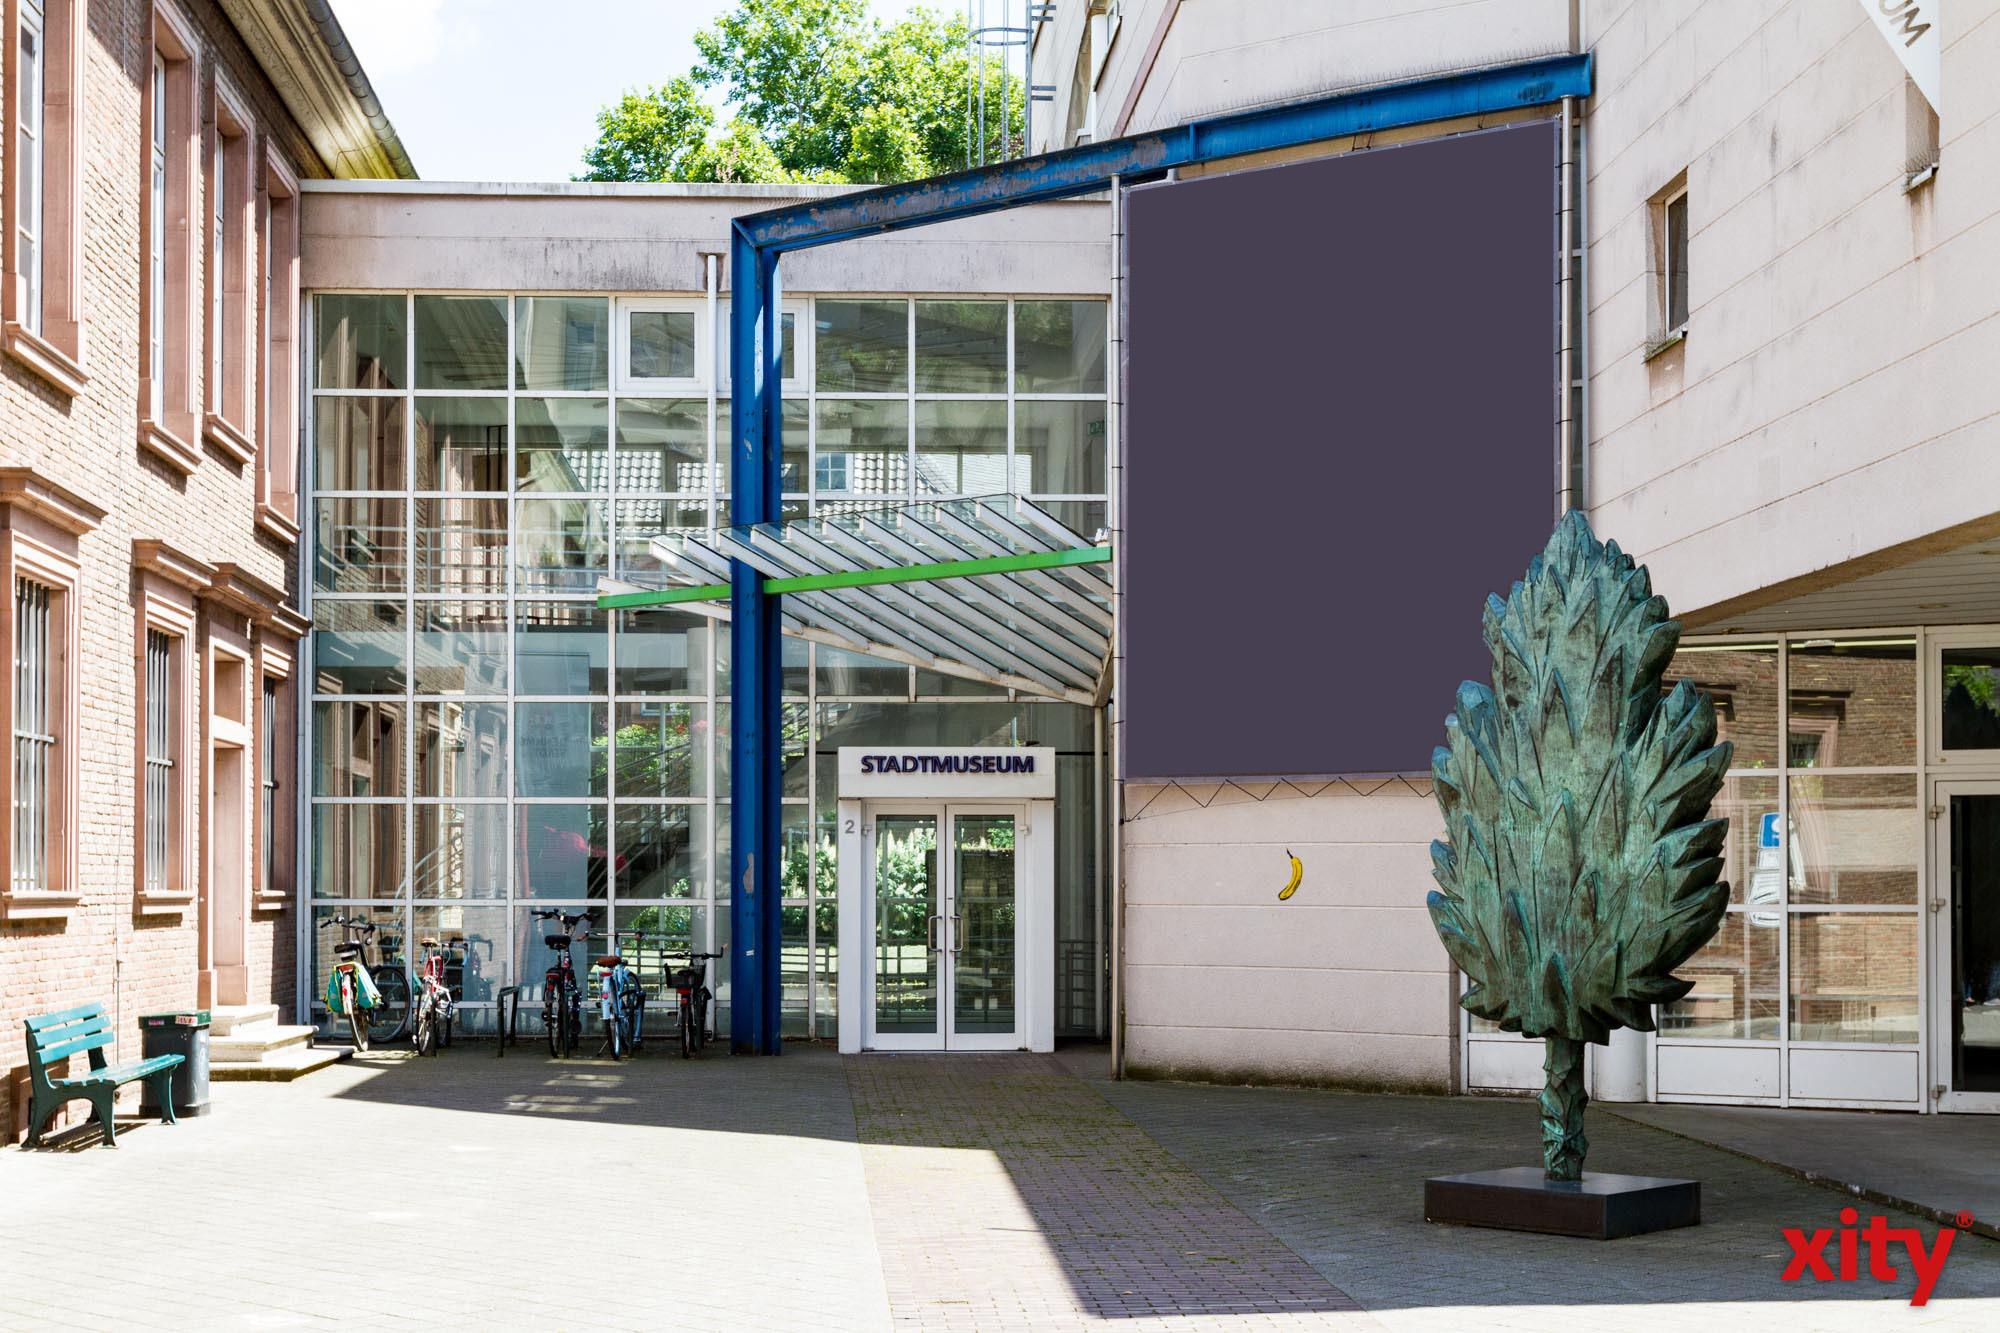 Ausstellung zu Chris Reinecke im Stadtmuseum Düsseldorf (Foto: xity)